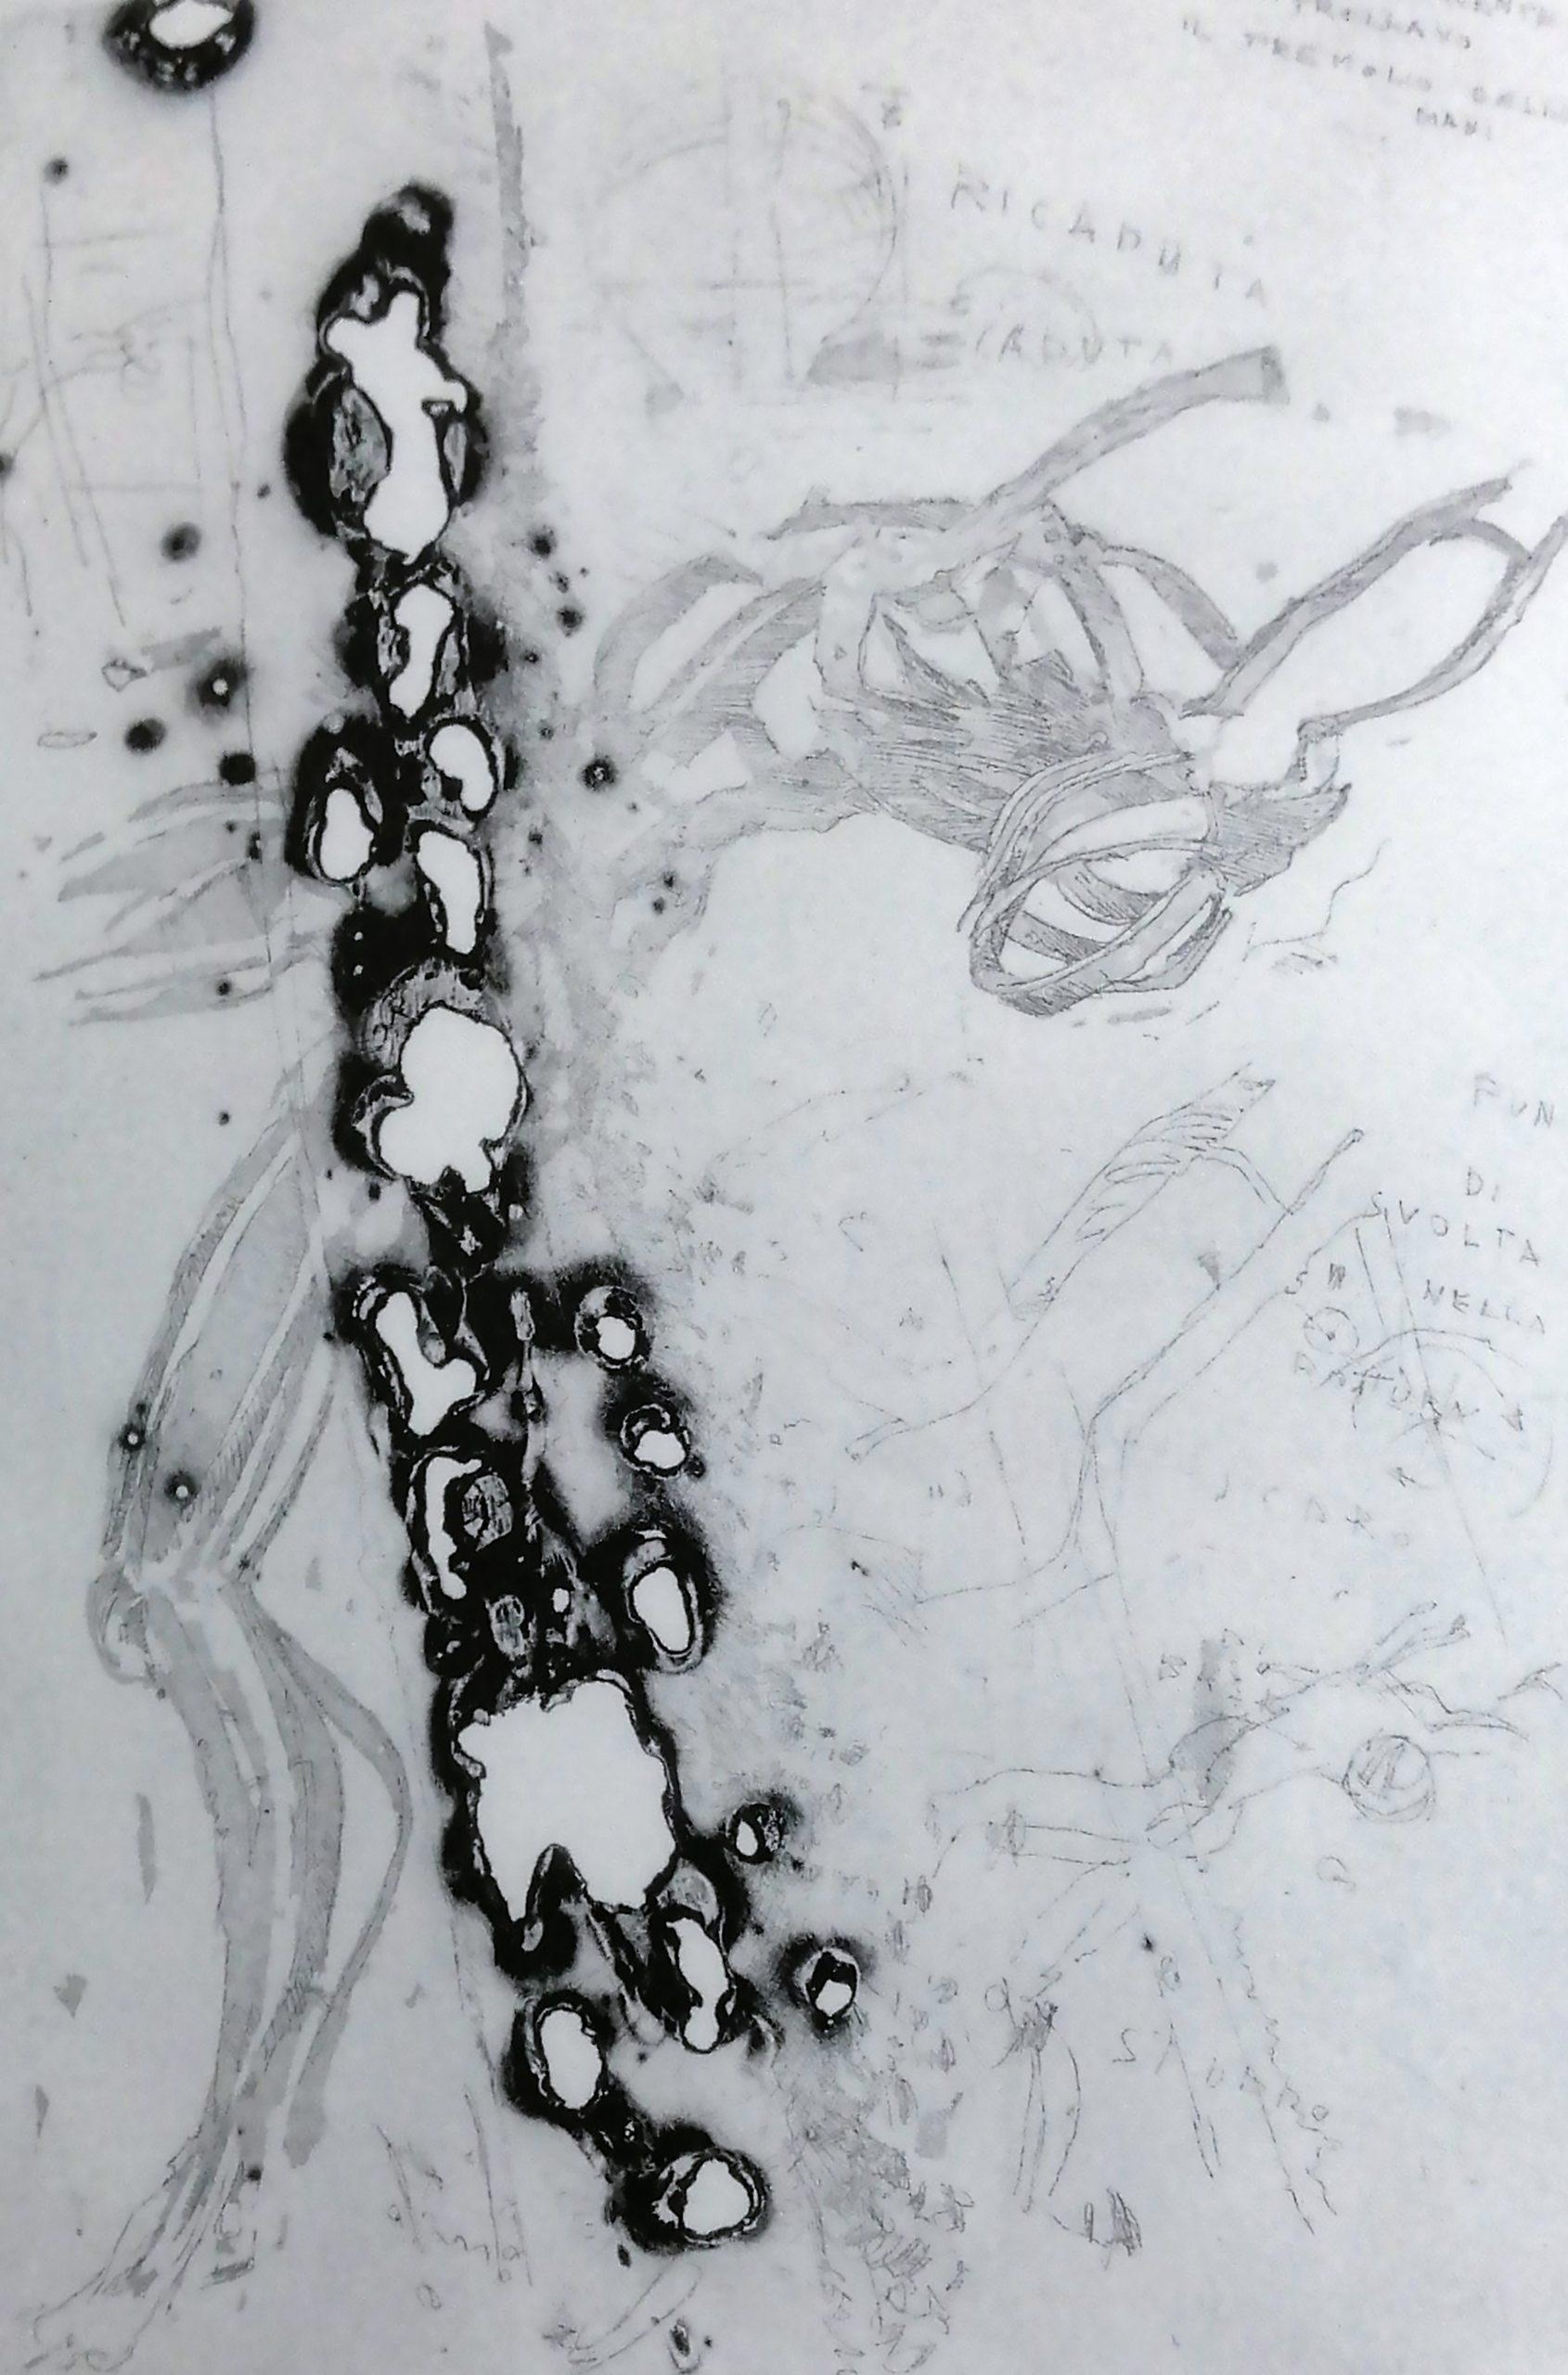 2003 2007 Bianco Nero.imm  scaled - Bibliography/ Catalogues